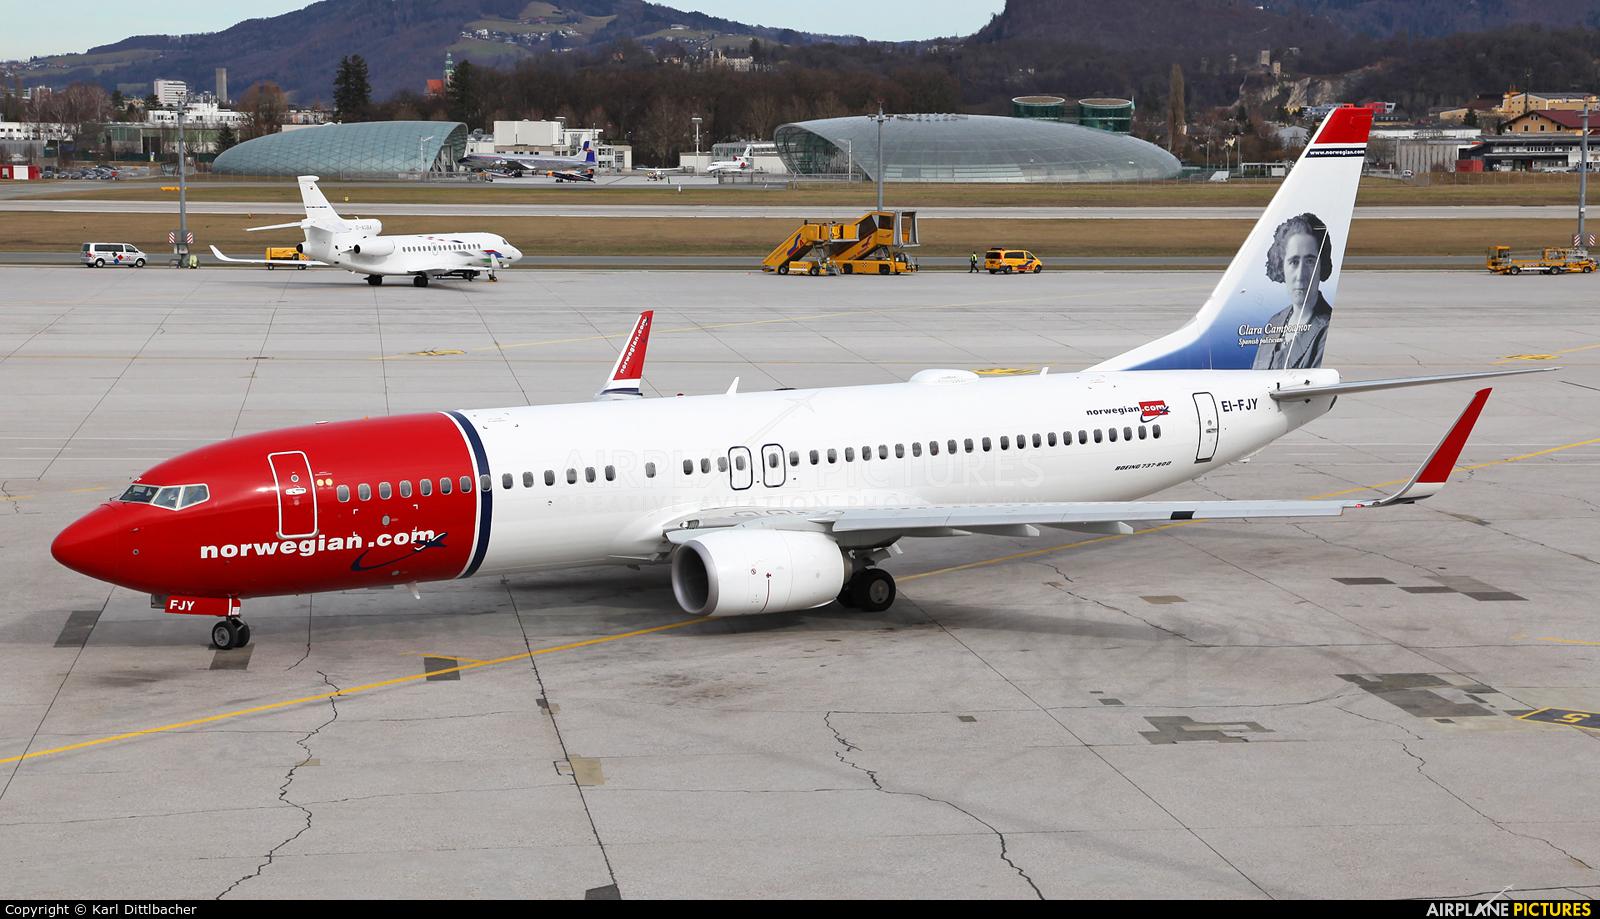 Norwegian Air International EI-FJY aircraft at Salzburg